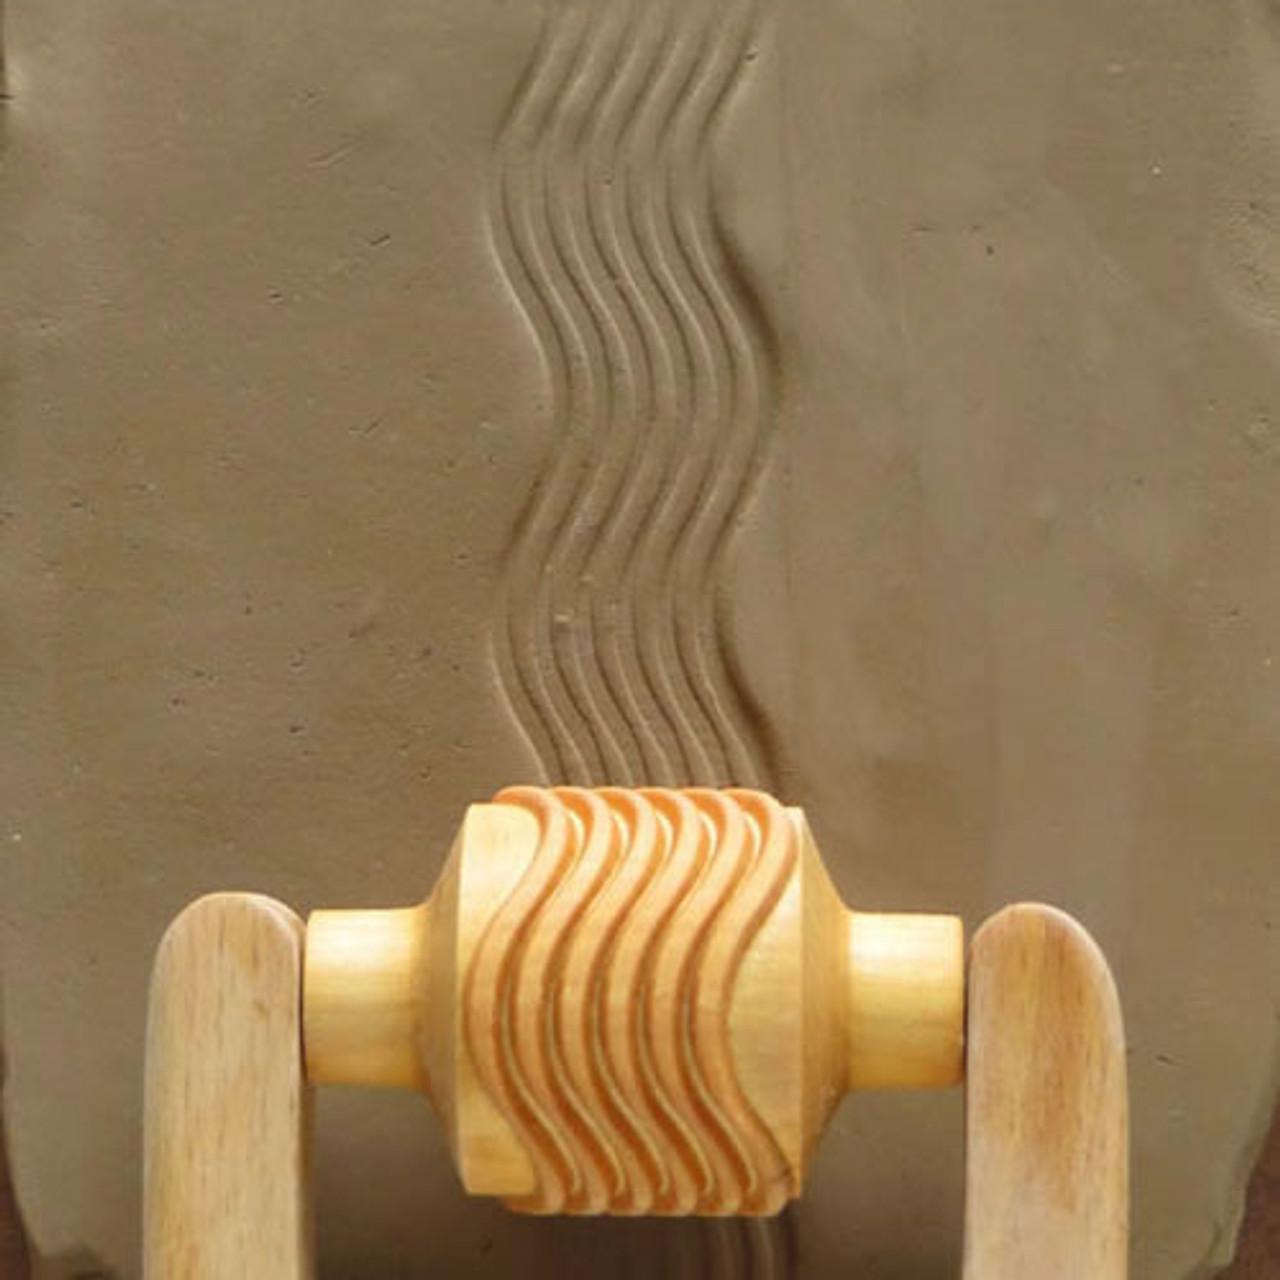 RM-017 Waves - 3 cm Roller